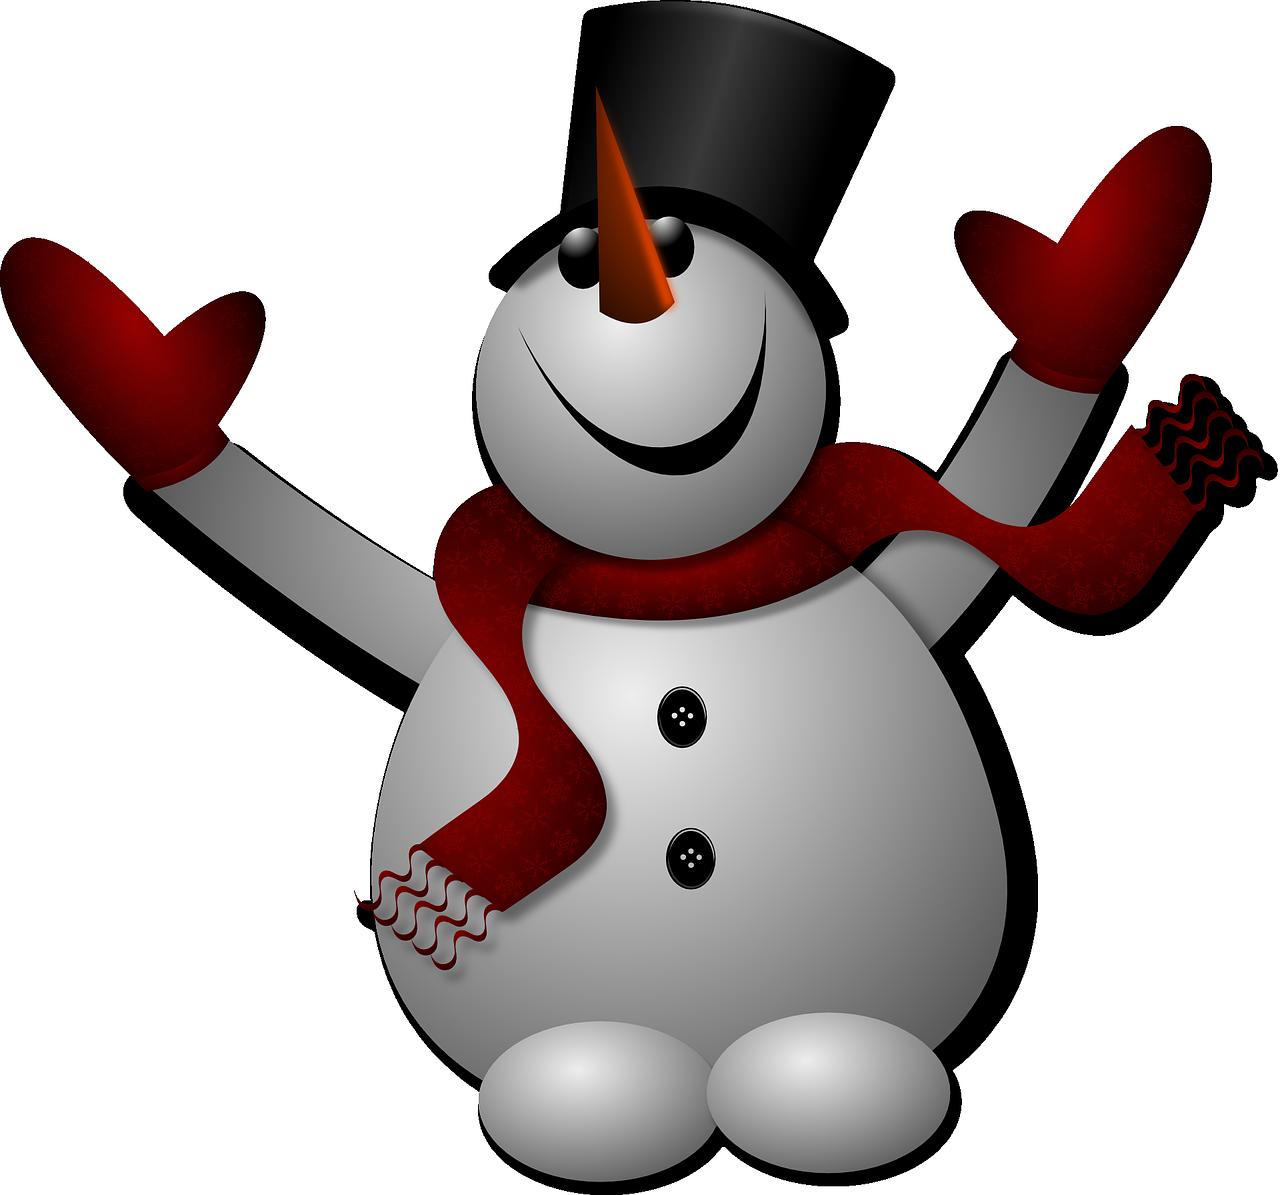 Snow facts for kids. Sunglasses clipart snowman